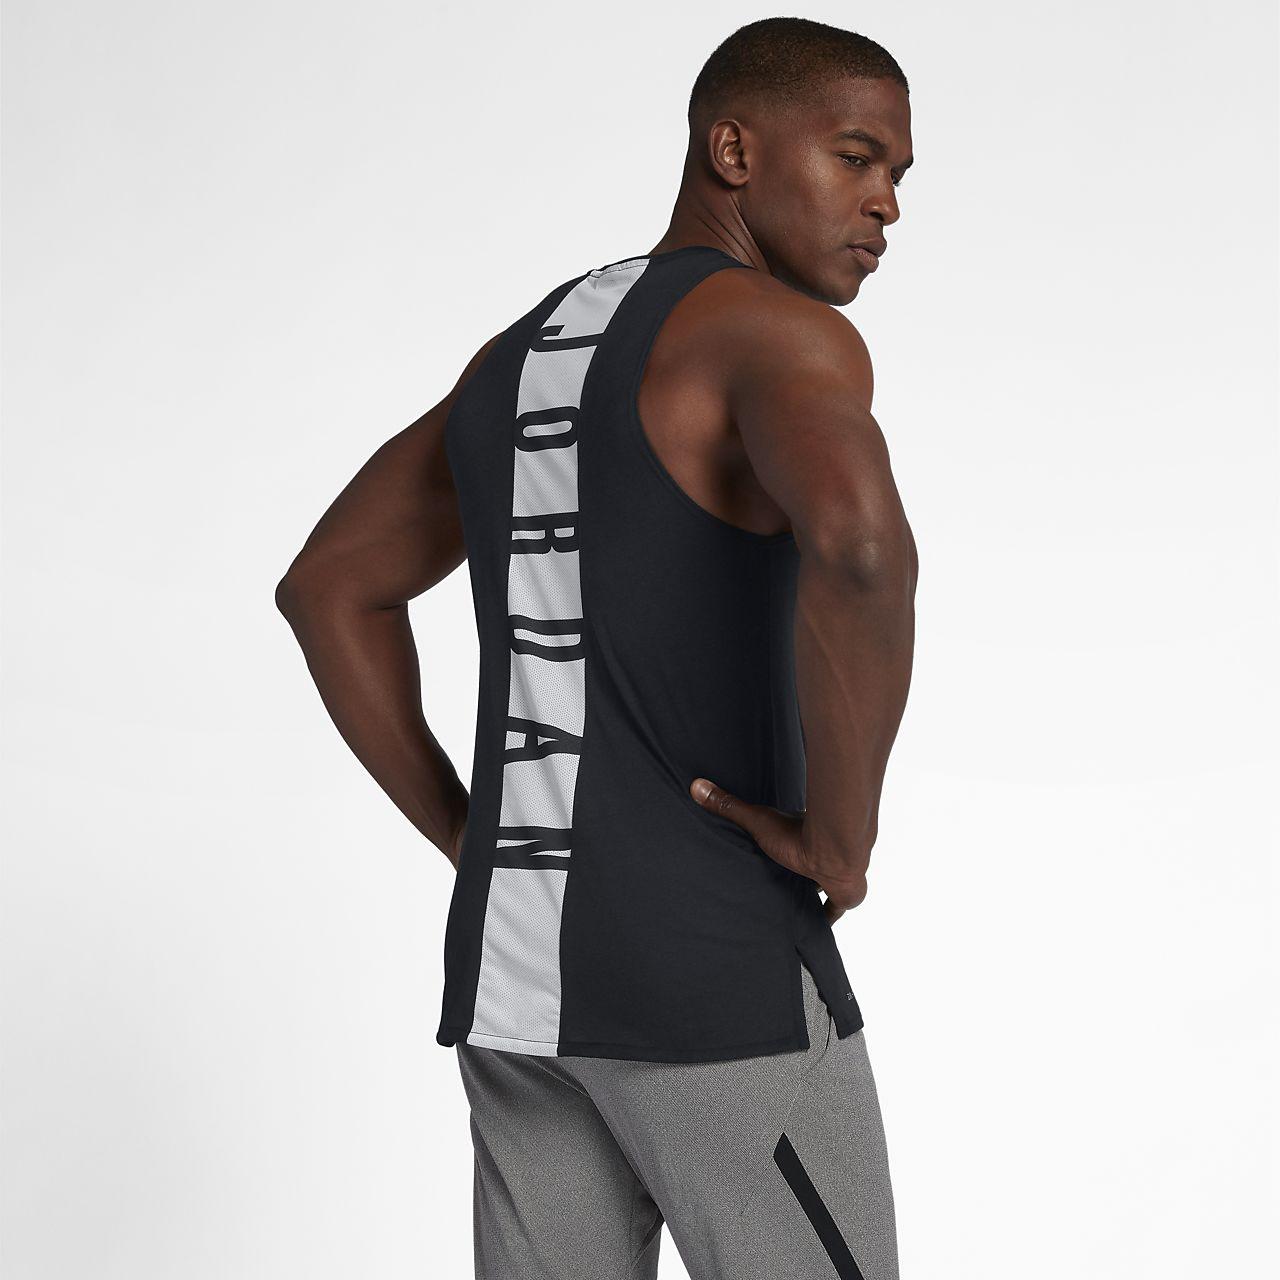 Jordan 23 Alpha Men's Sleeveless Training Top